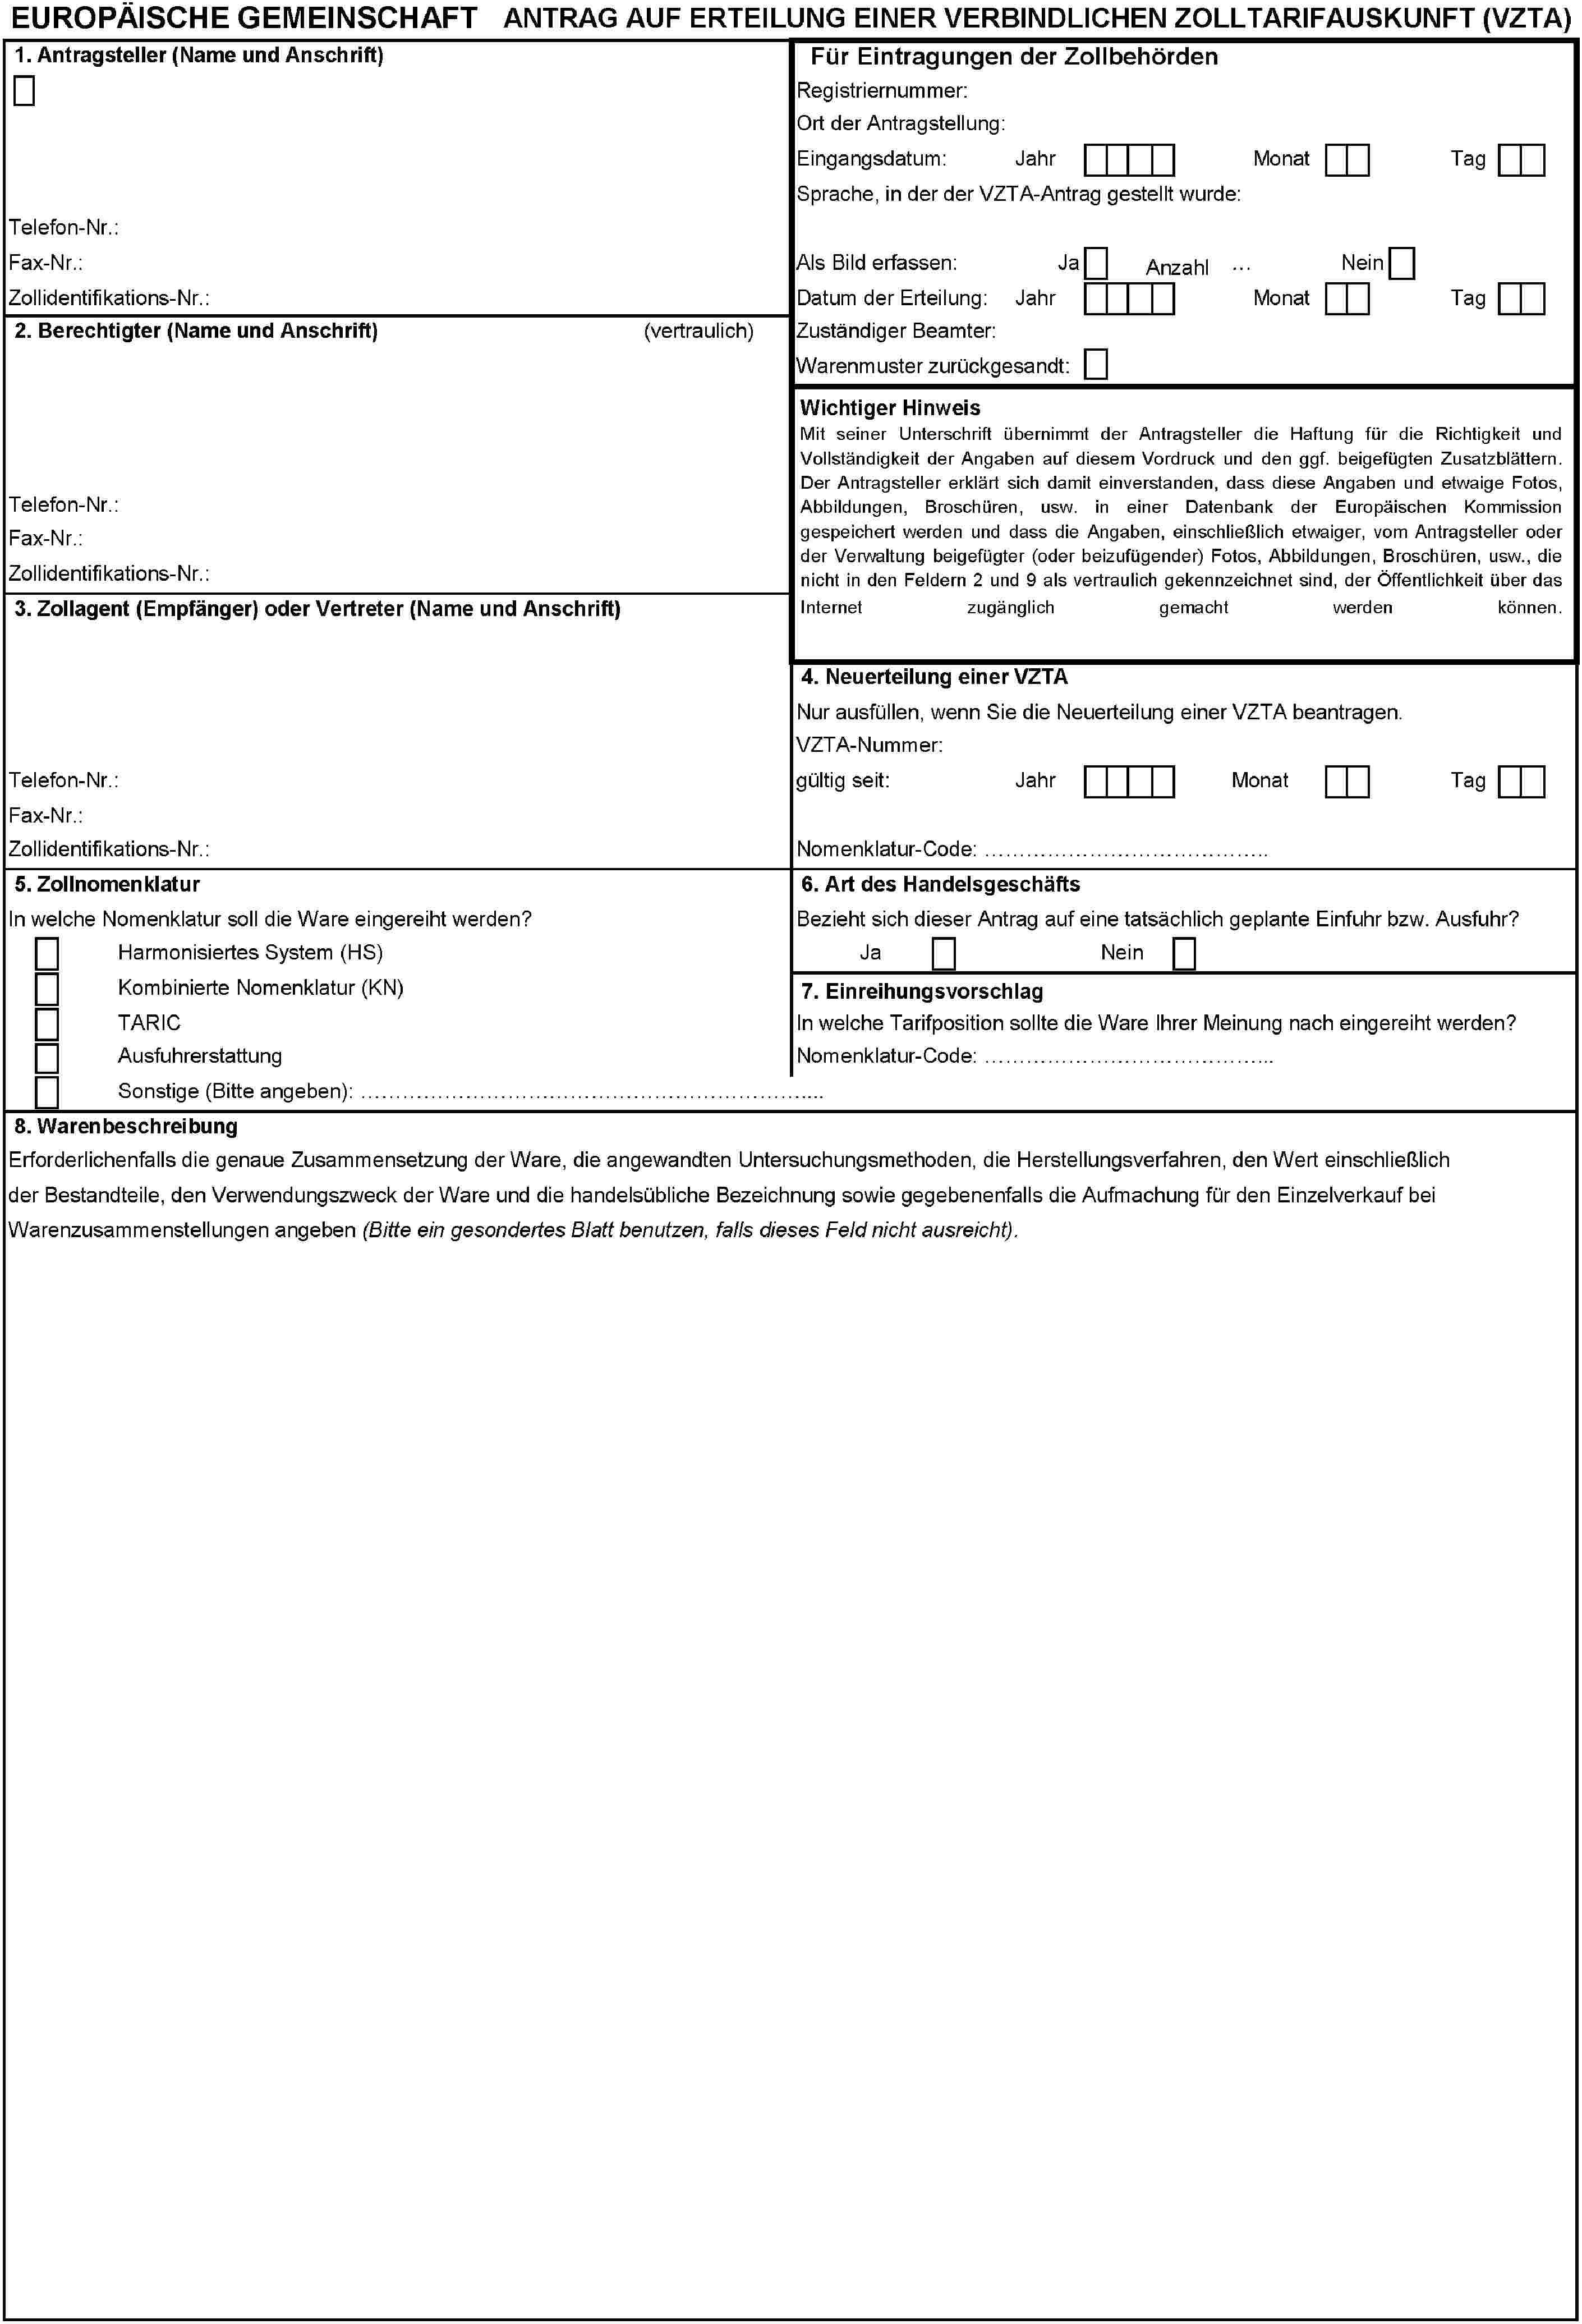 EUR Lex R2454 EN EUR Lex